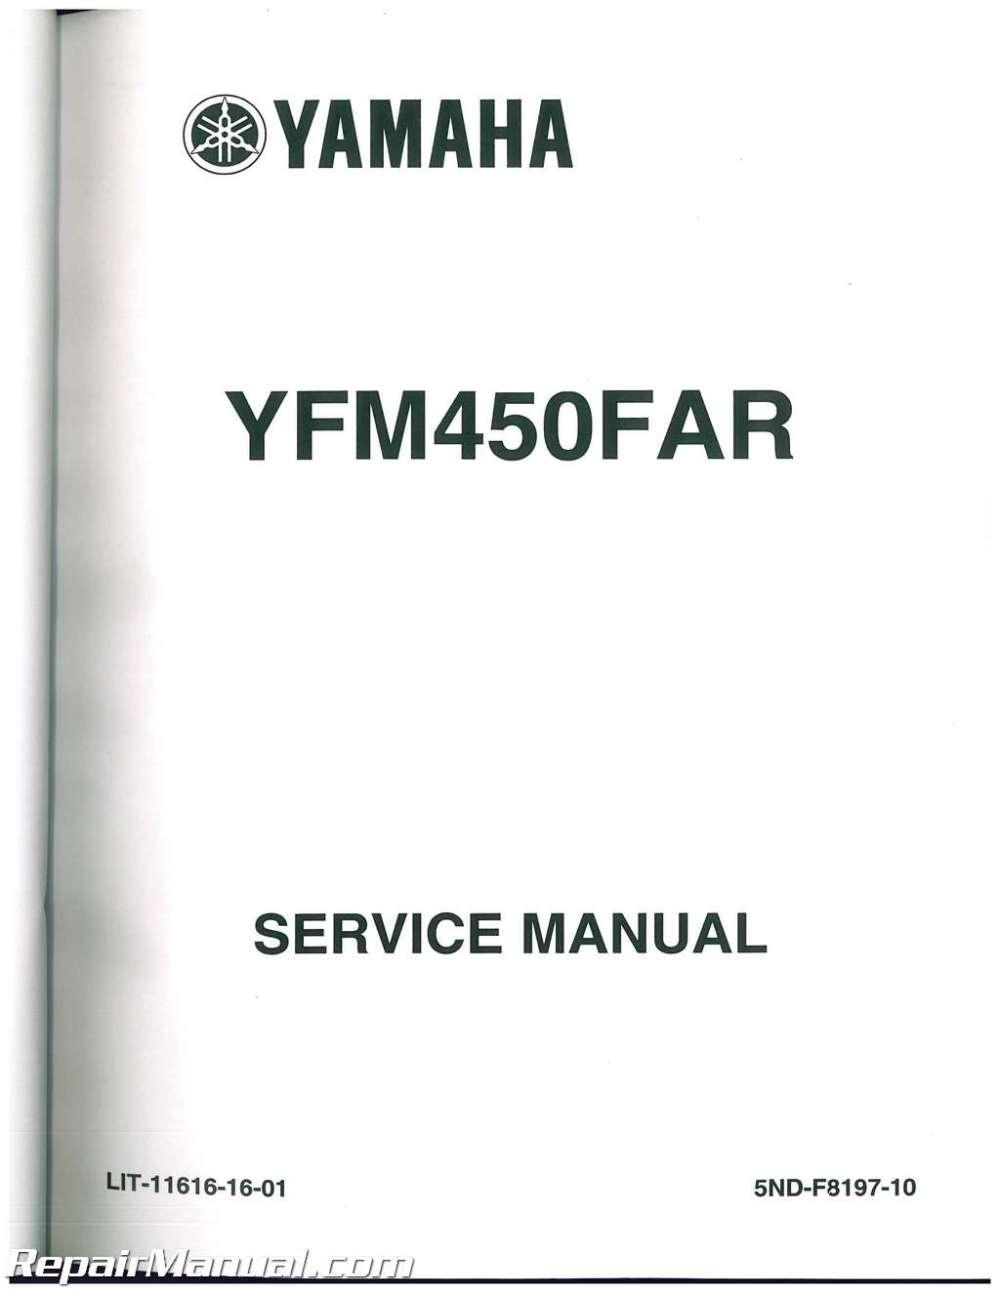 medium resolution of 2003 2006 yamaha kodiak 450 4wd 2007 2014 grizzly 450 4wd service manual rh repairmanual com alpine amp wiring diagram 2003 yamaha kodiak wiring diagram